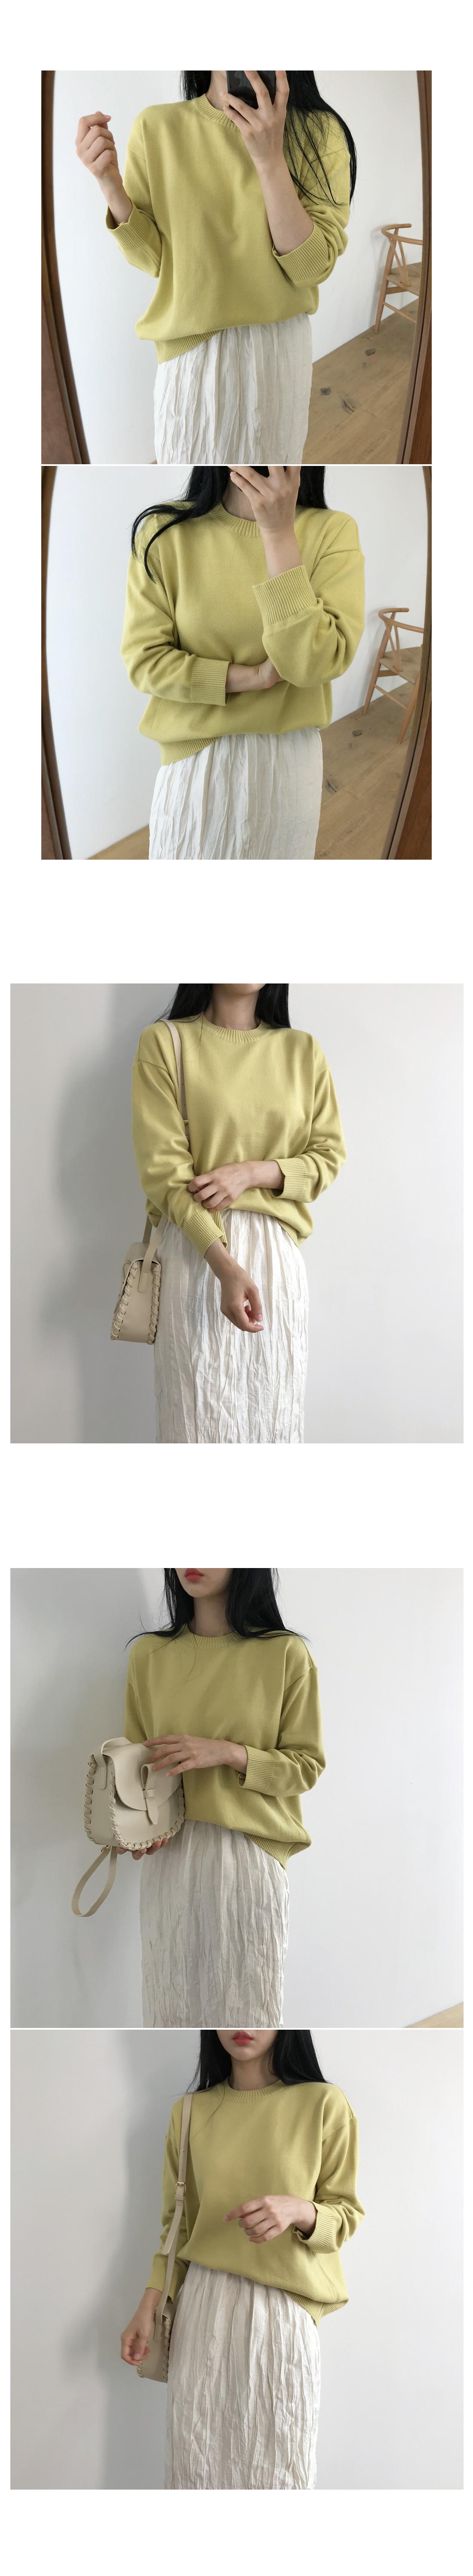 Knit round knit